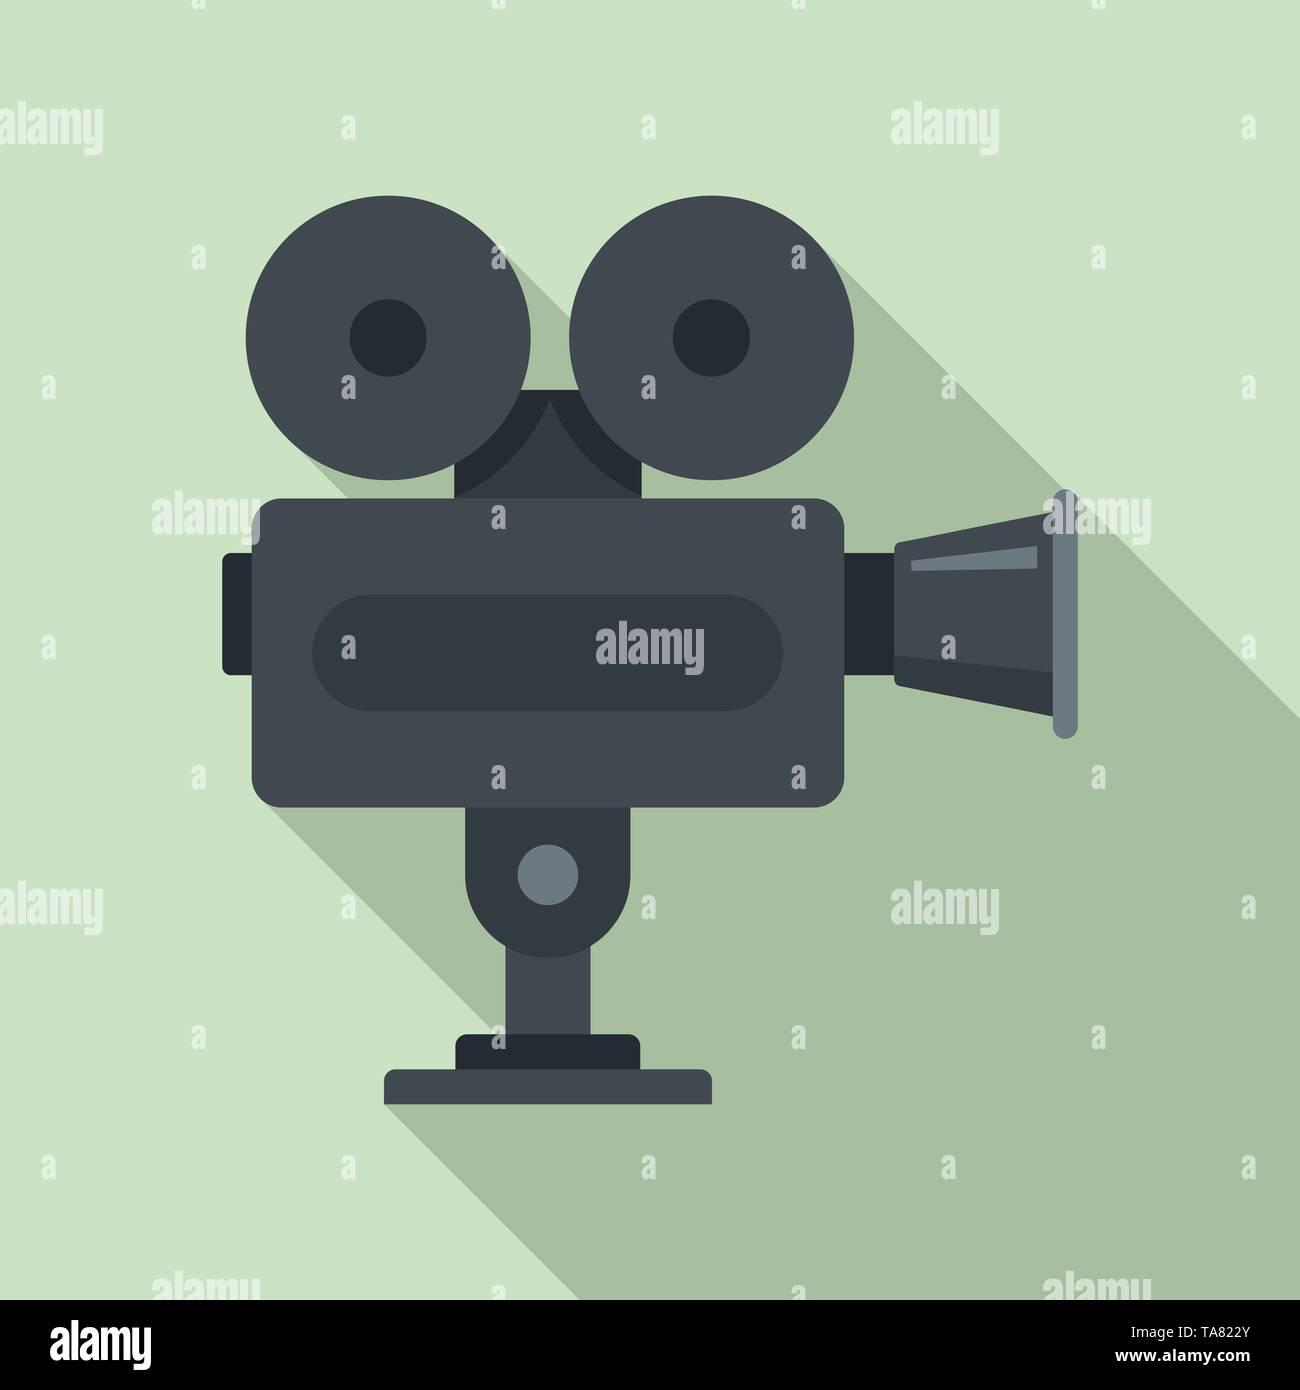 Cinema camera icon. Flat illustration of cinema camera vector icon for web design - Stock Image